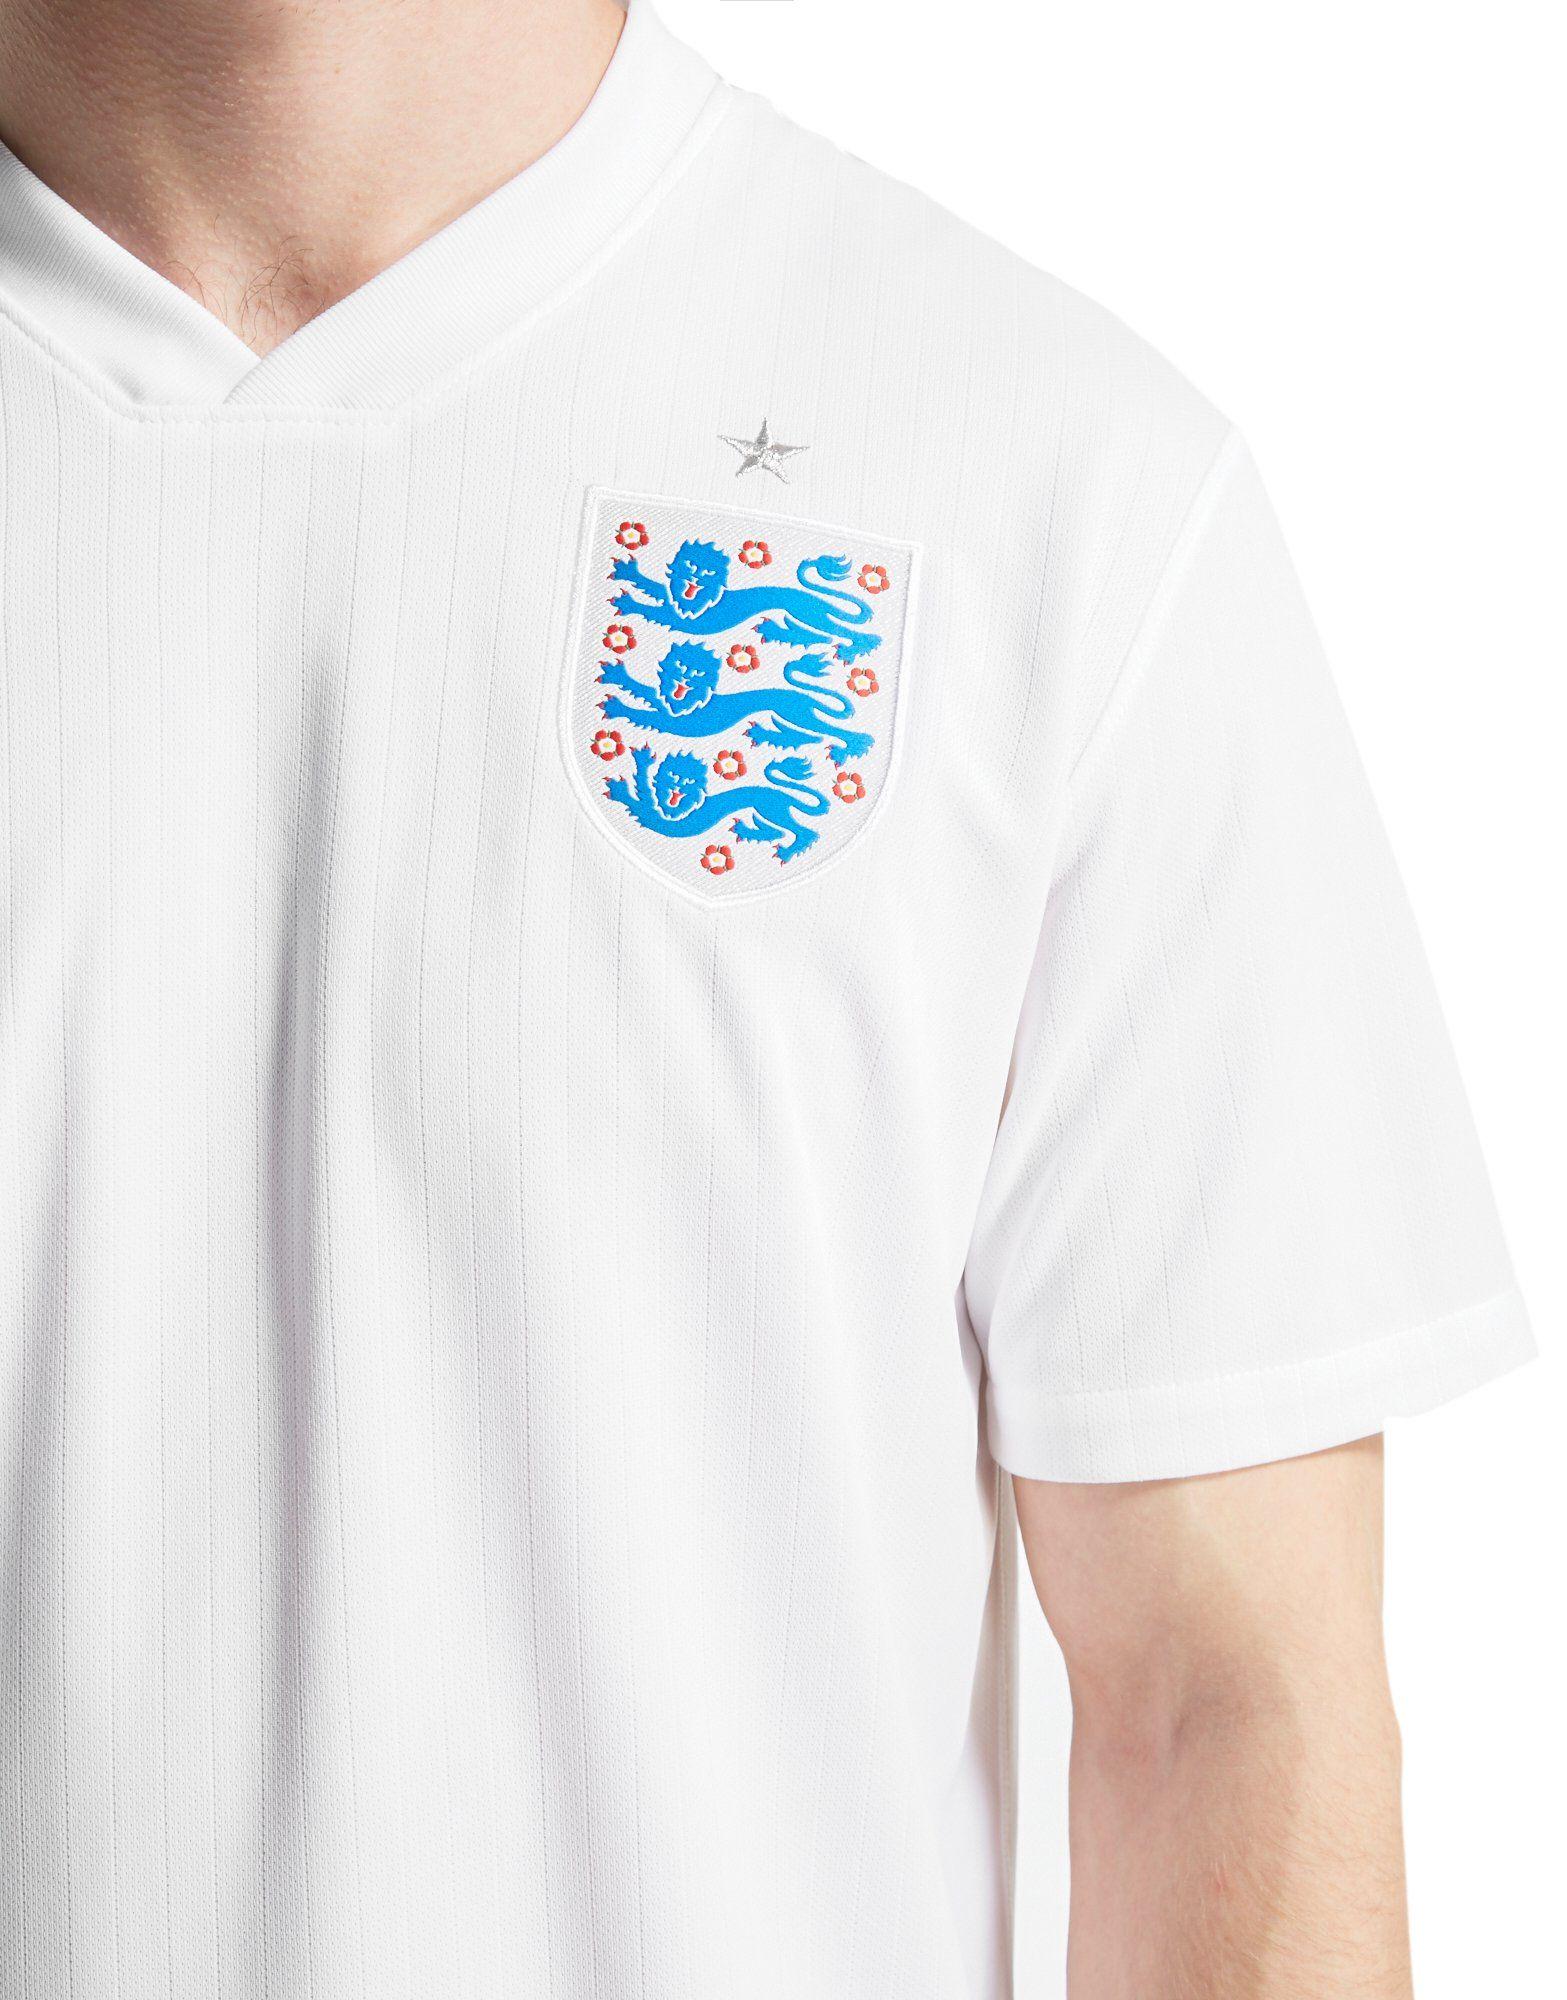 Nike England 2014 Stadium Home Shirt